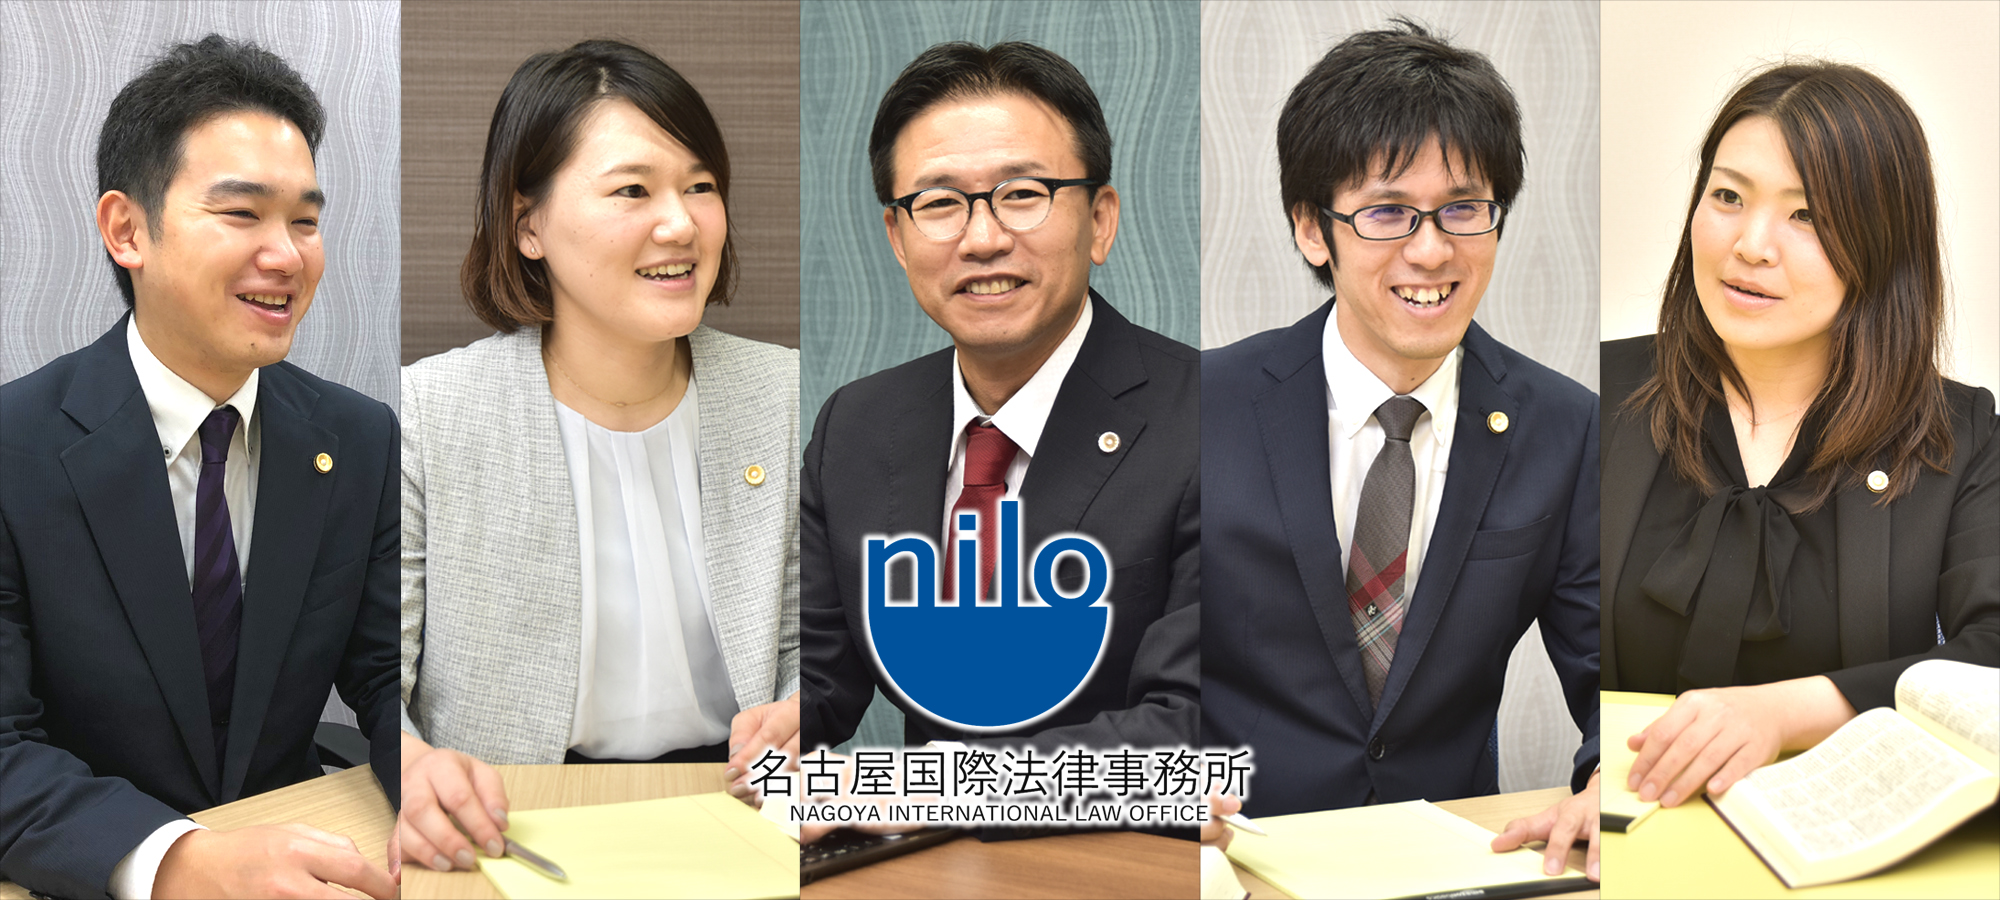 Nagoya International Law Office